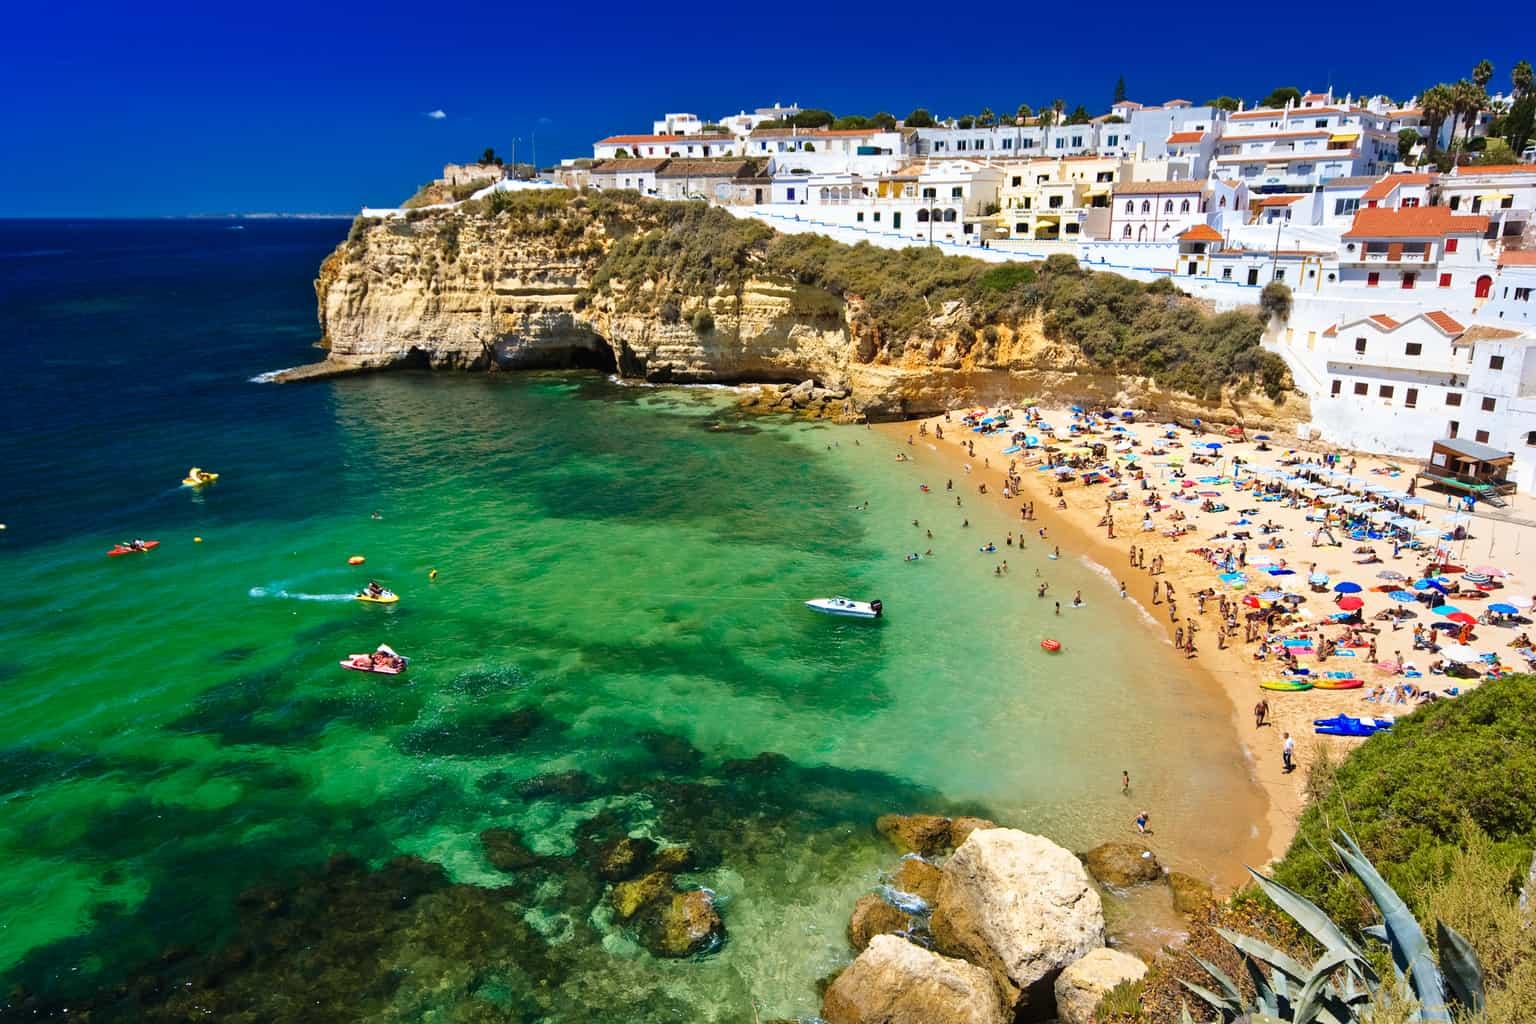 Algarve rock coast in Portugal